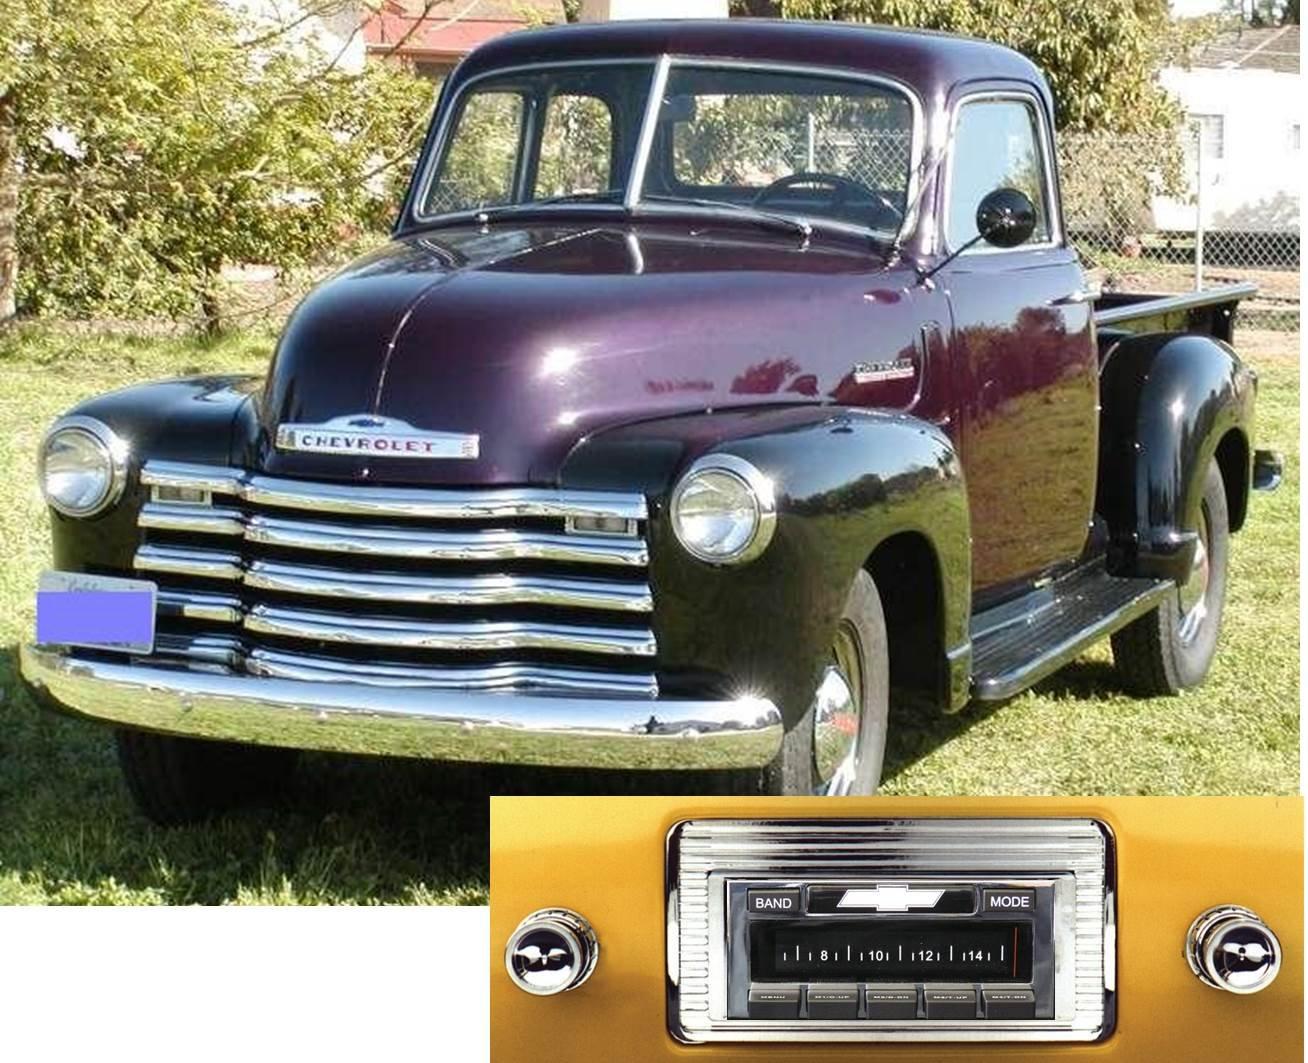 1947-1953 Chevy Truck USA-630 II High Power 300 watt AM FM Car Stereo/Radio with iPod Docking Cable by Custom Autosound B00ZYAKTIO